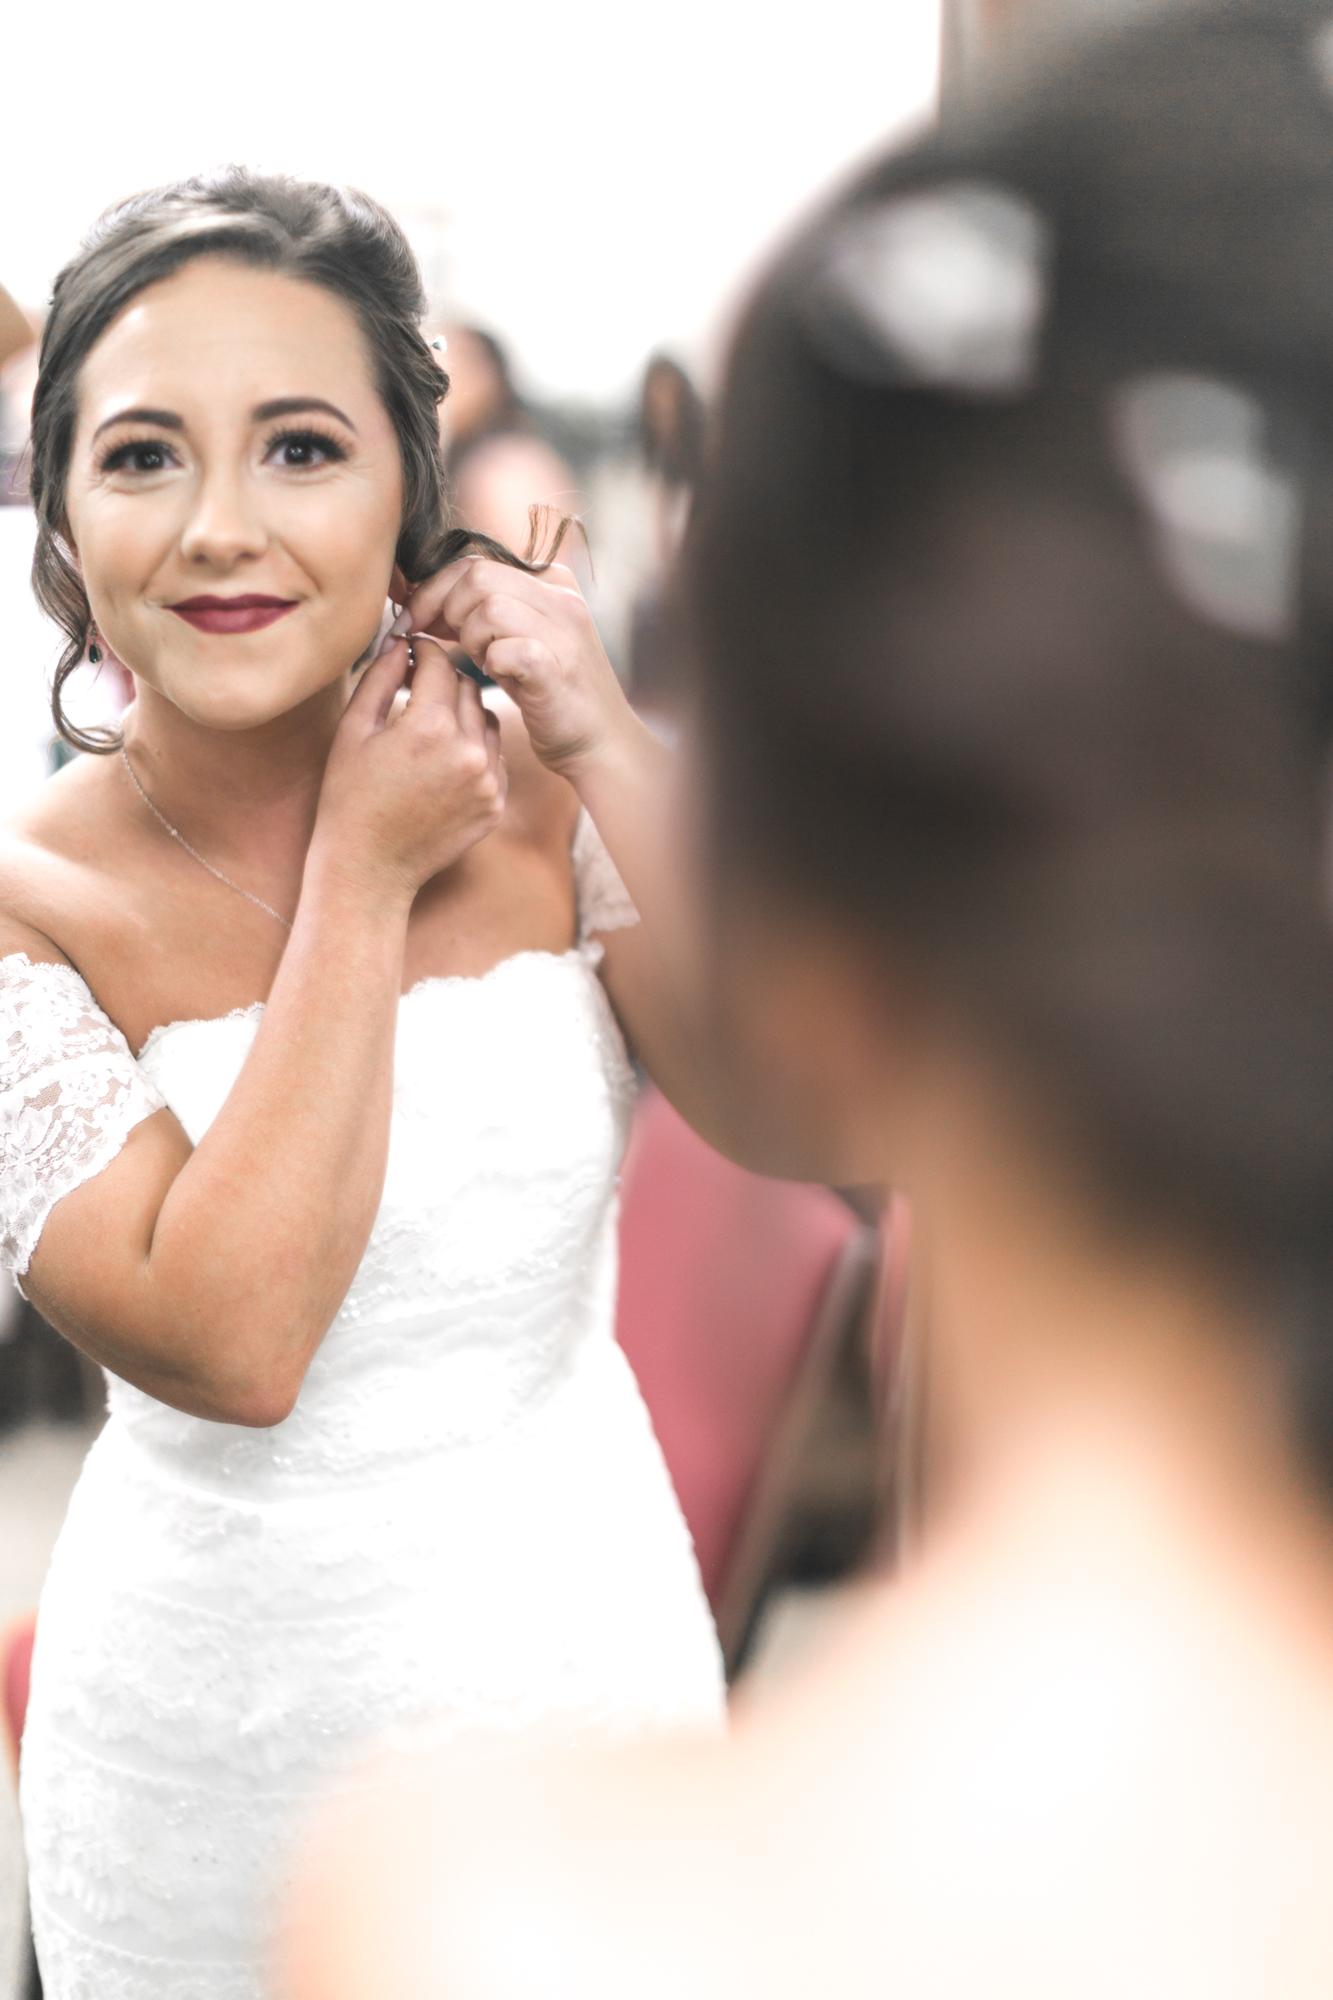 Seymour-Matte Wedding-13.jpg